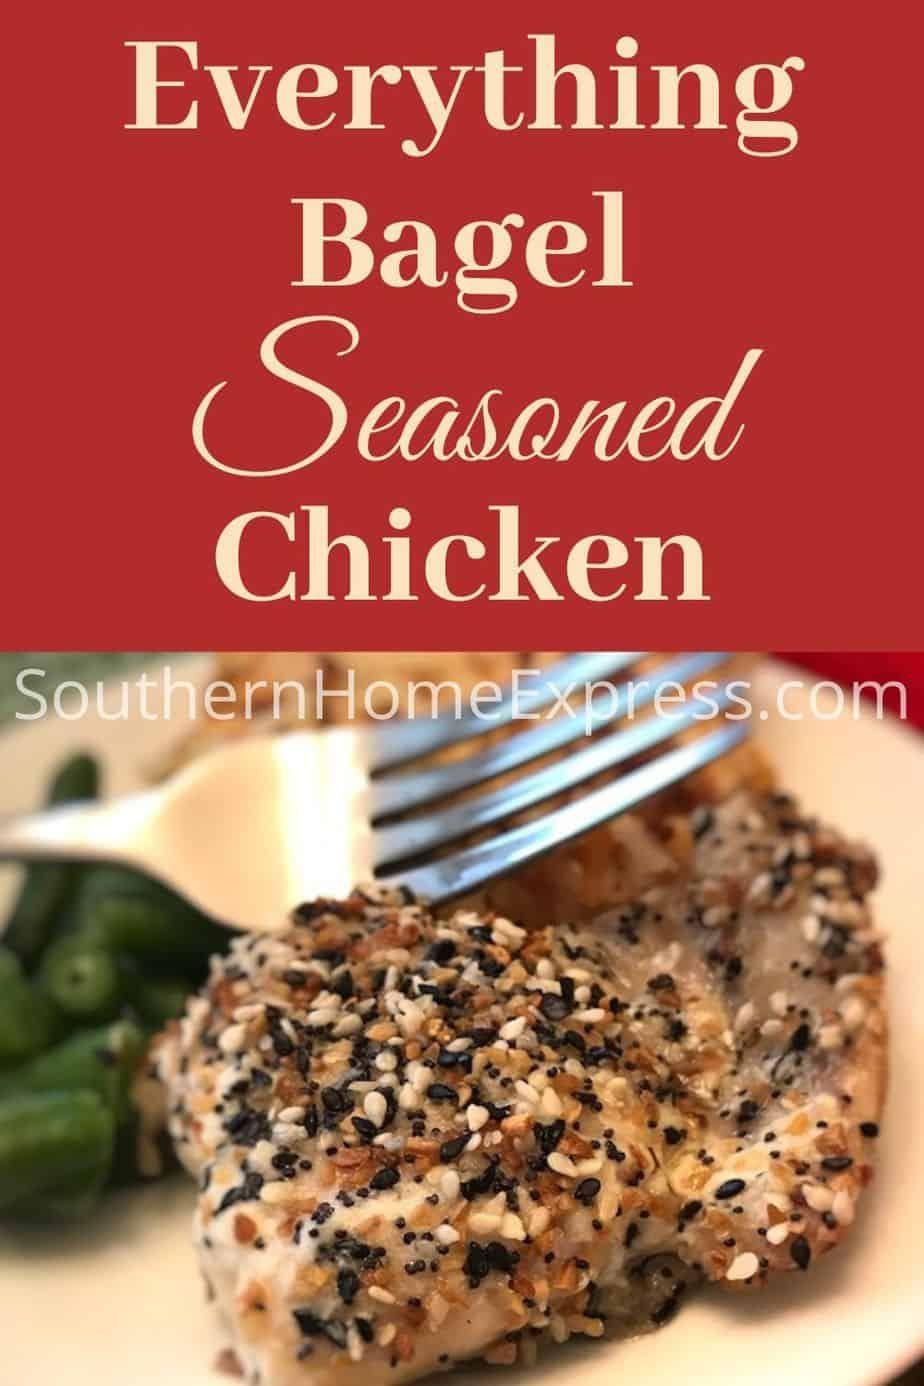 Everything Bagel Seasoned Chicken Recipe In 2020 Chicken Seasoning Everything Bagel Chicken Appetizers